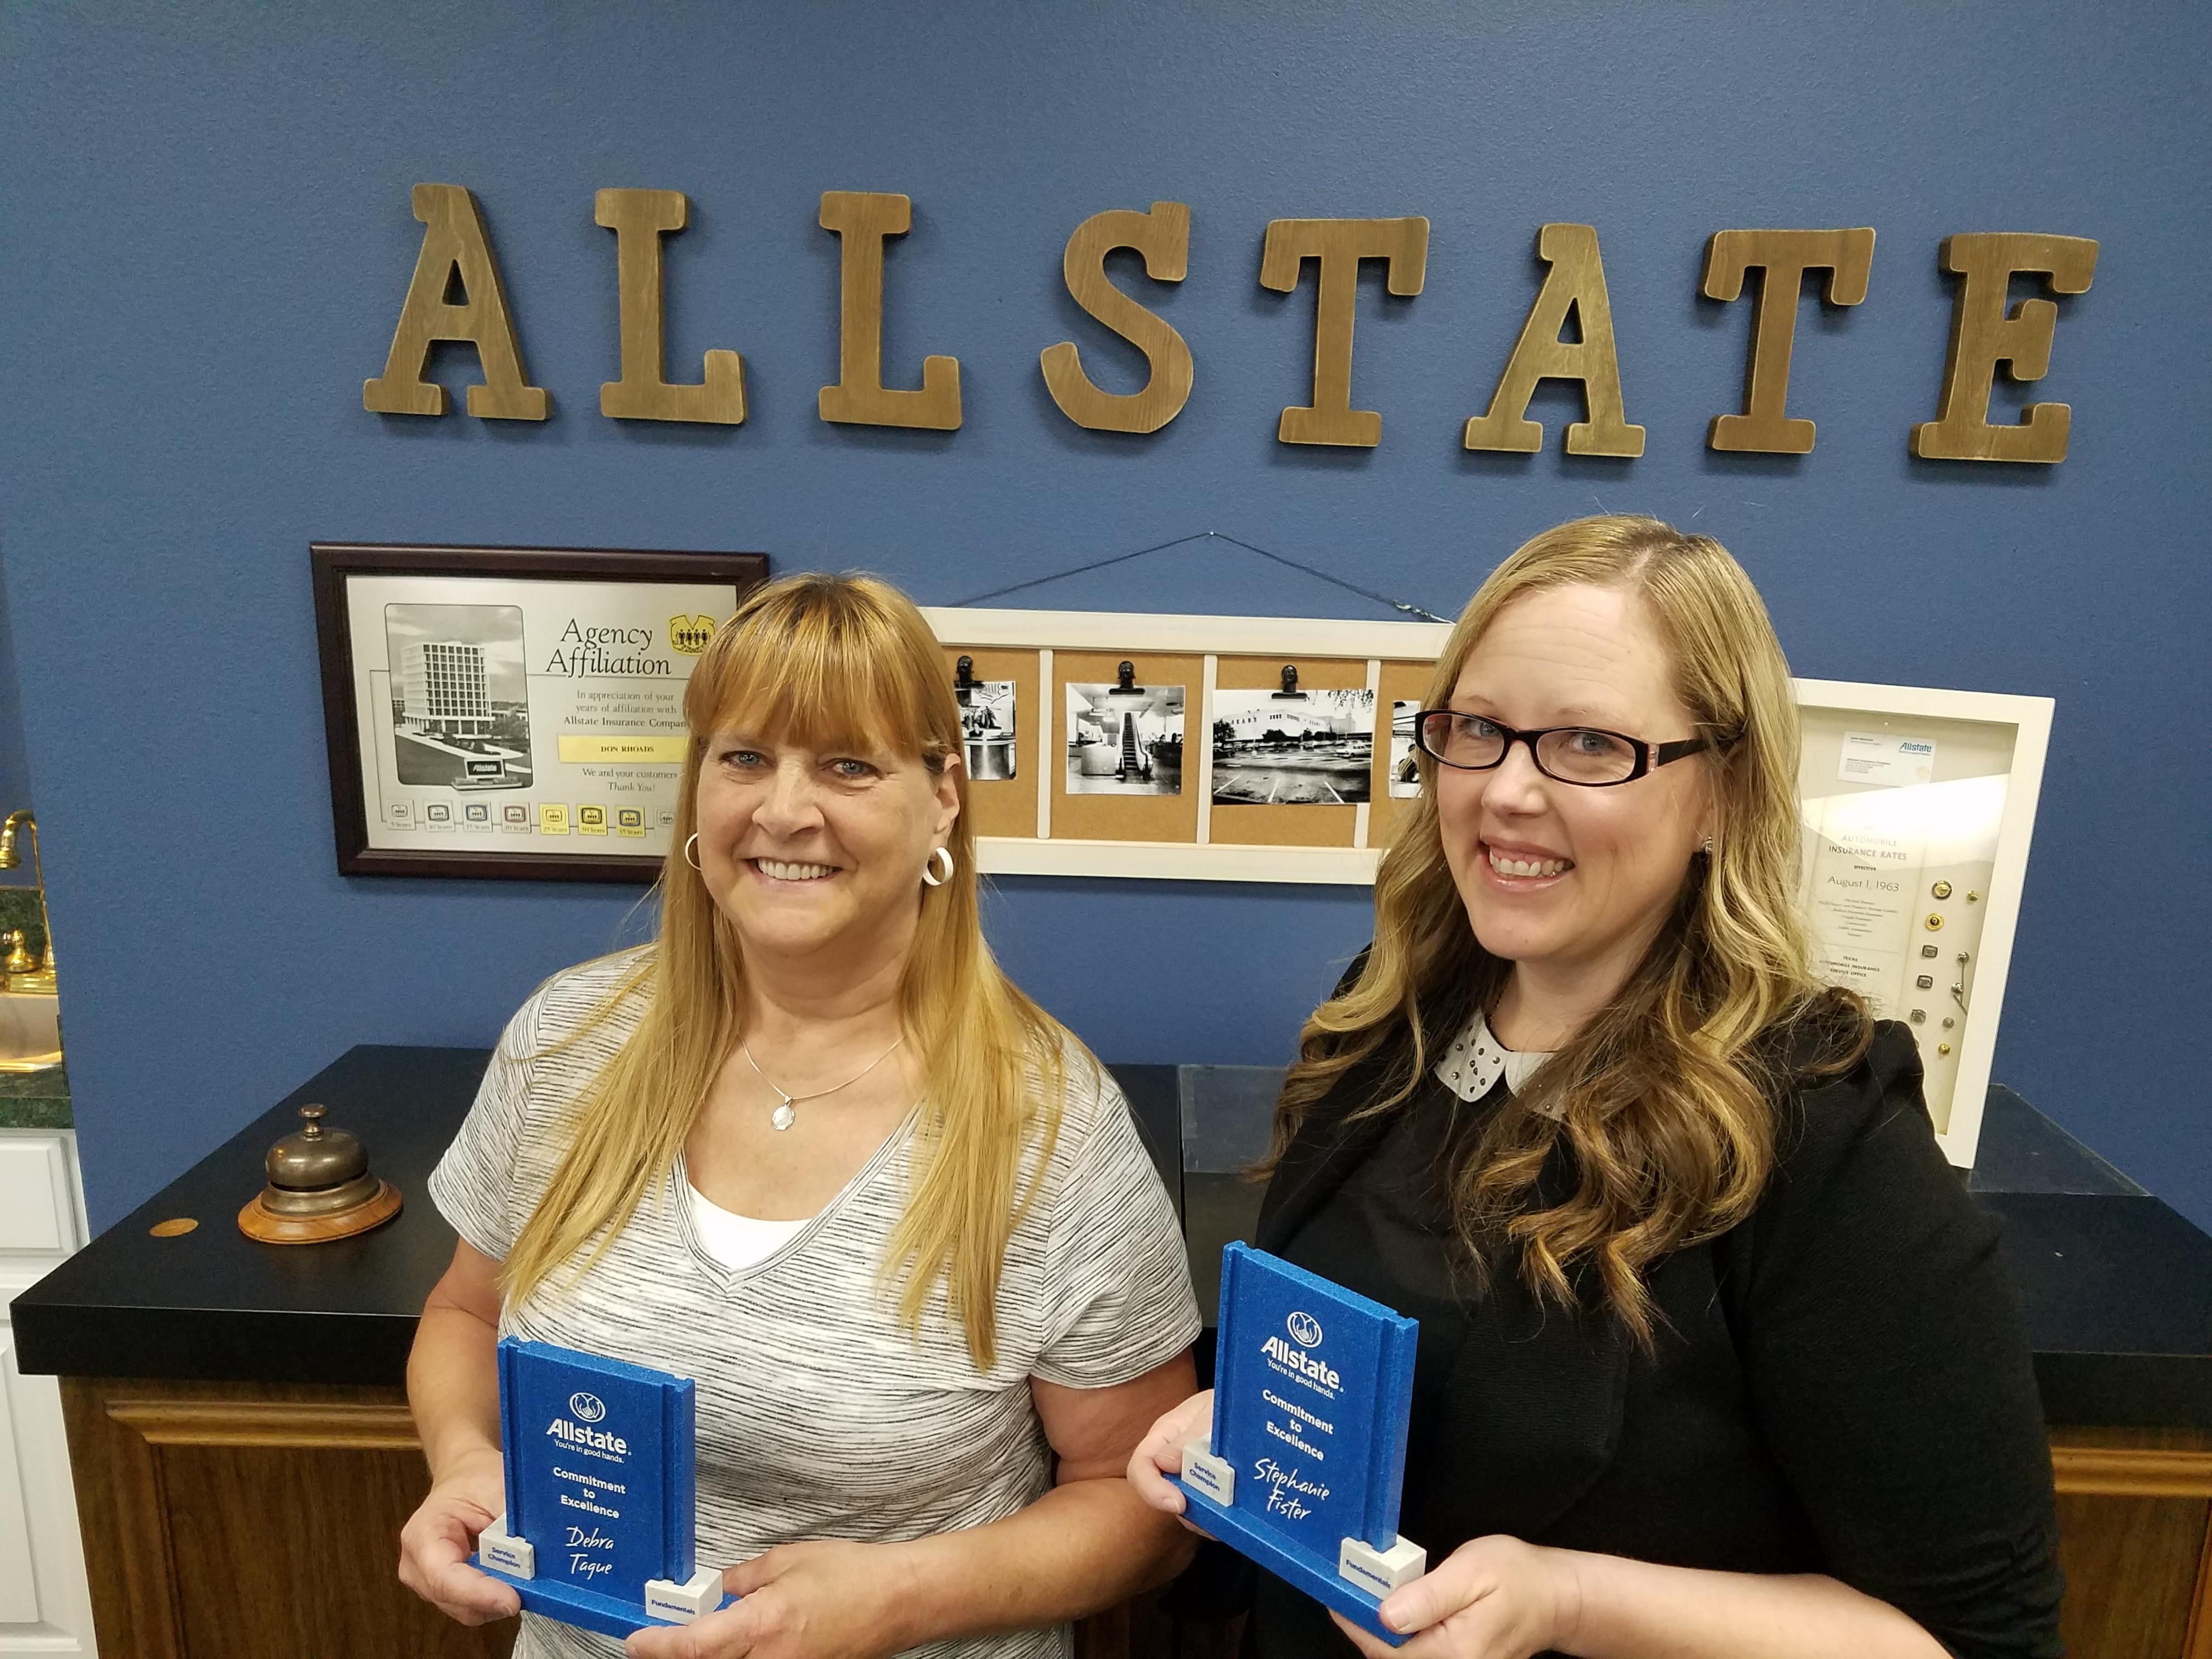 Leah Cheek: Allstate Insurance image 8